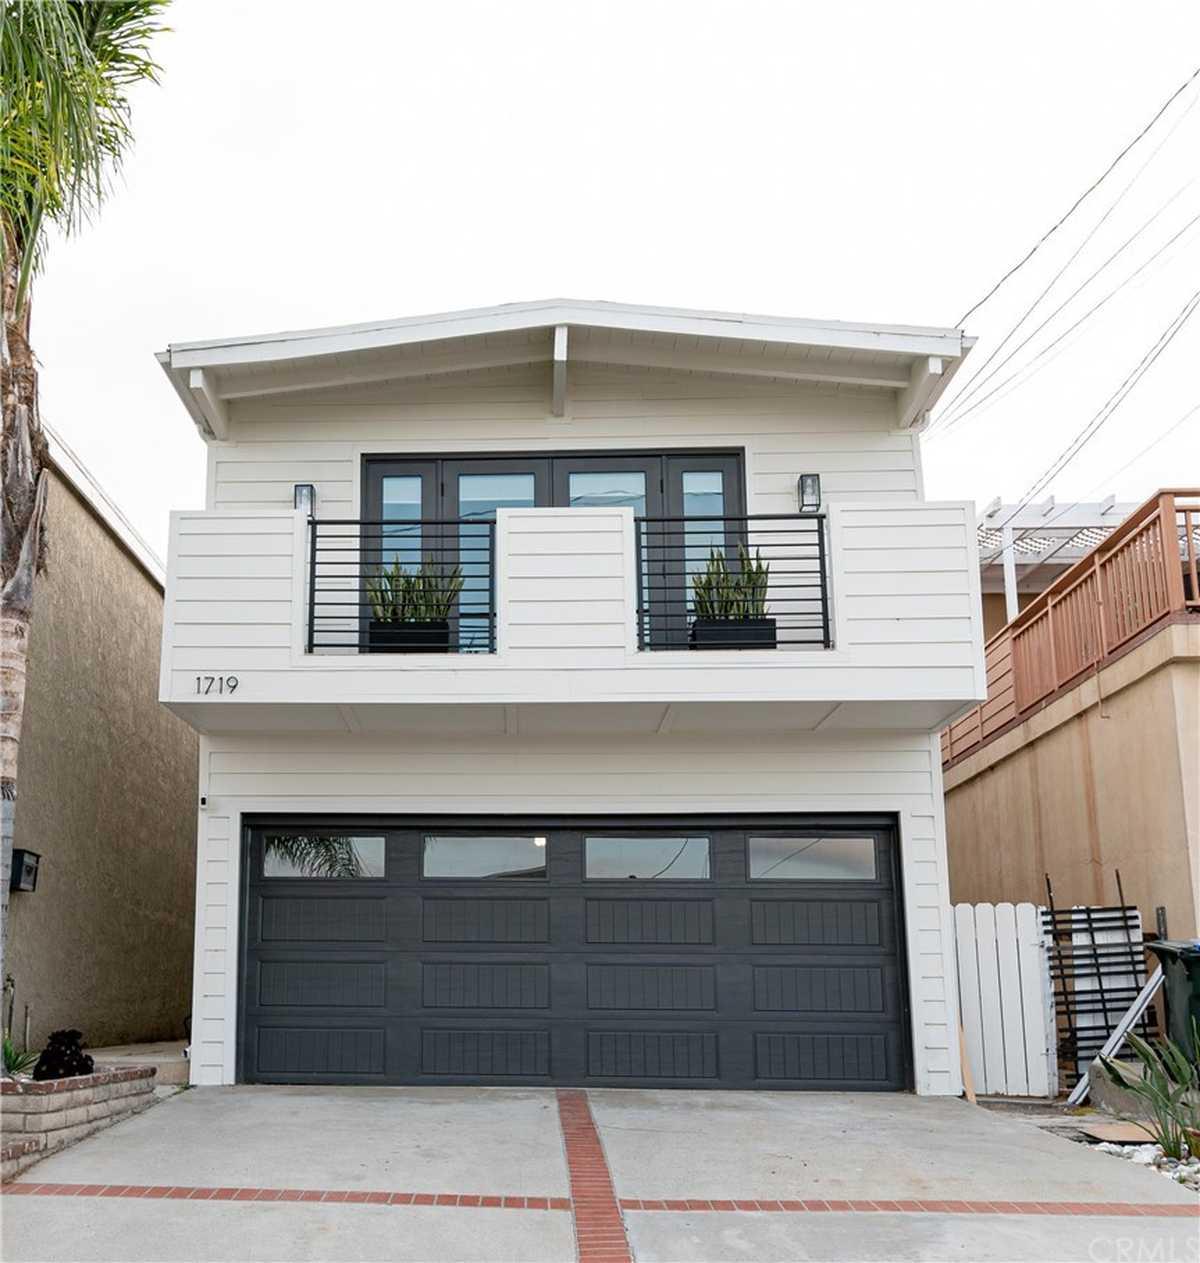 $1,400,000 - 3Br/2Ba -  for Sale in Redondo Beach